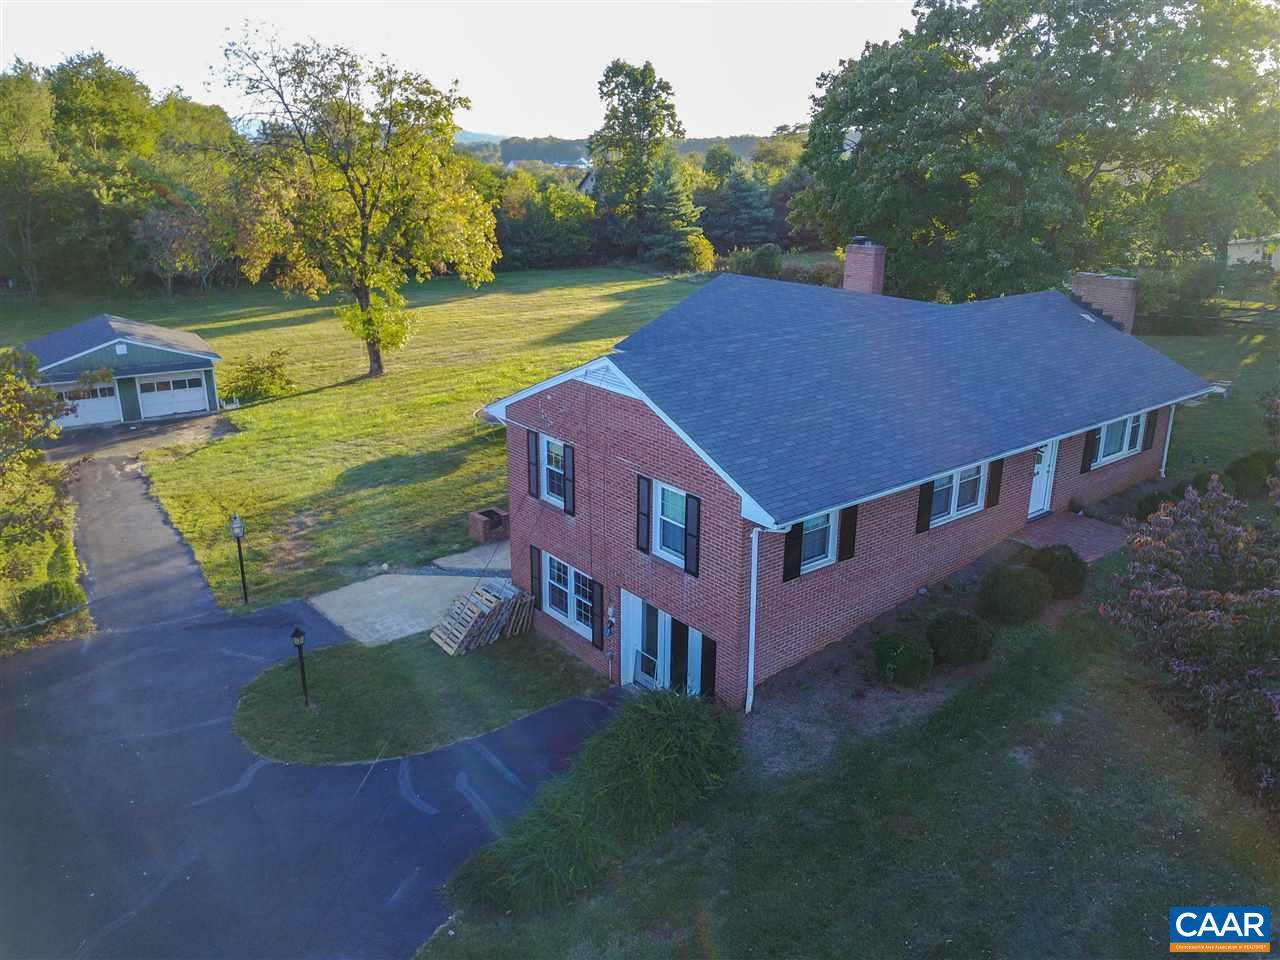 Single Family Home for Sale at 5967 JARMANS GAP Road 5967 JARMANS GAP Road Crozet, Virginia 22932 United States